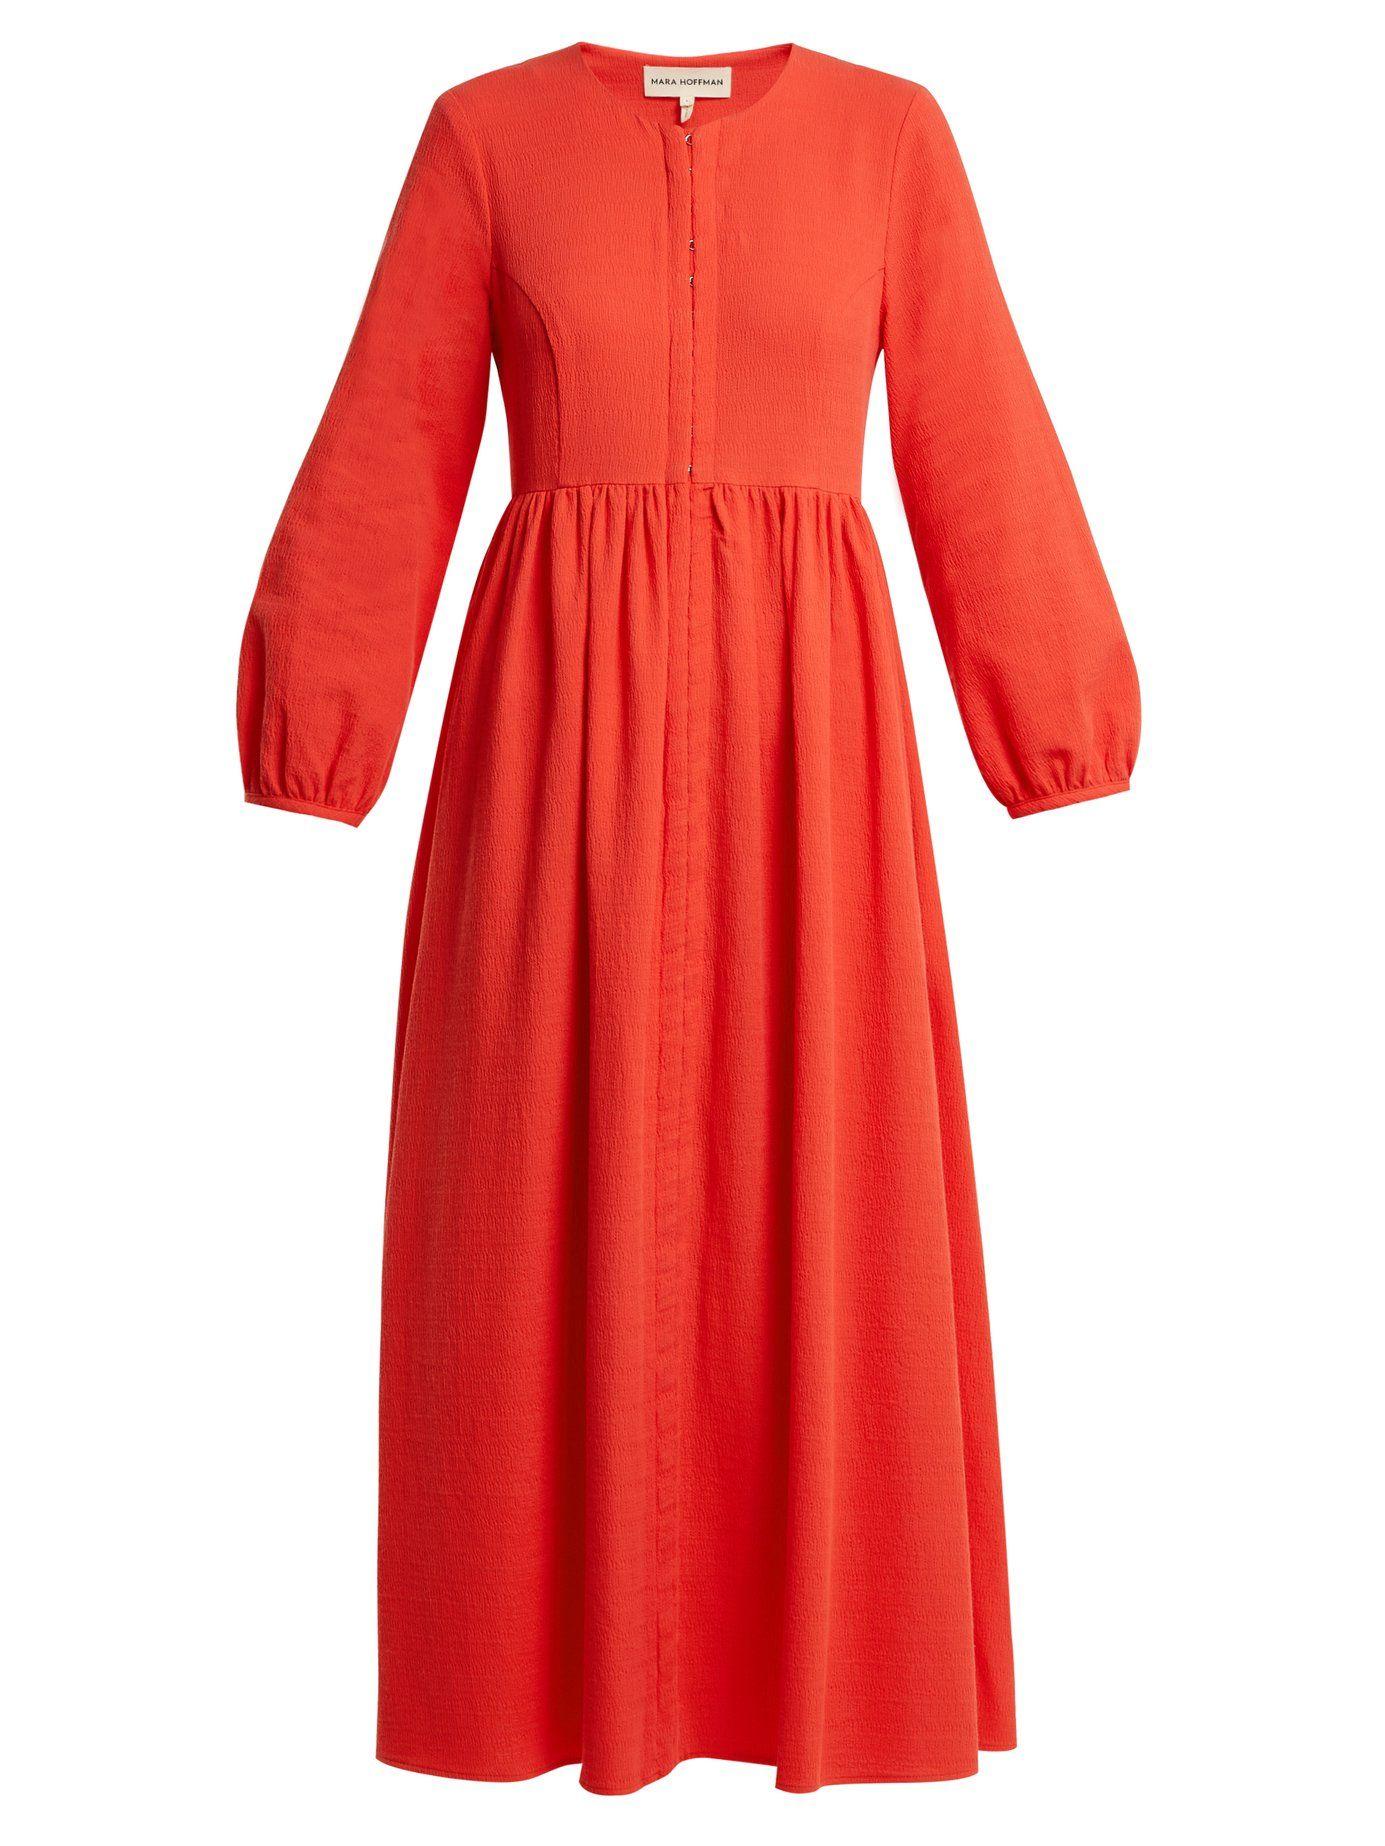 Paula balloon-sleeved organic-cotton dress Mara Hoffman 2A6a6